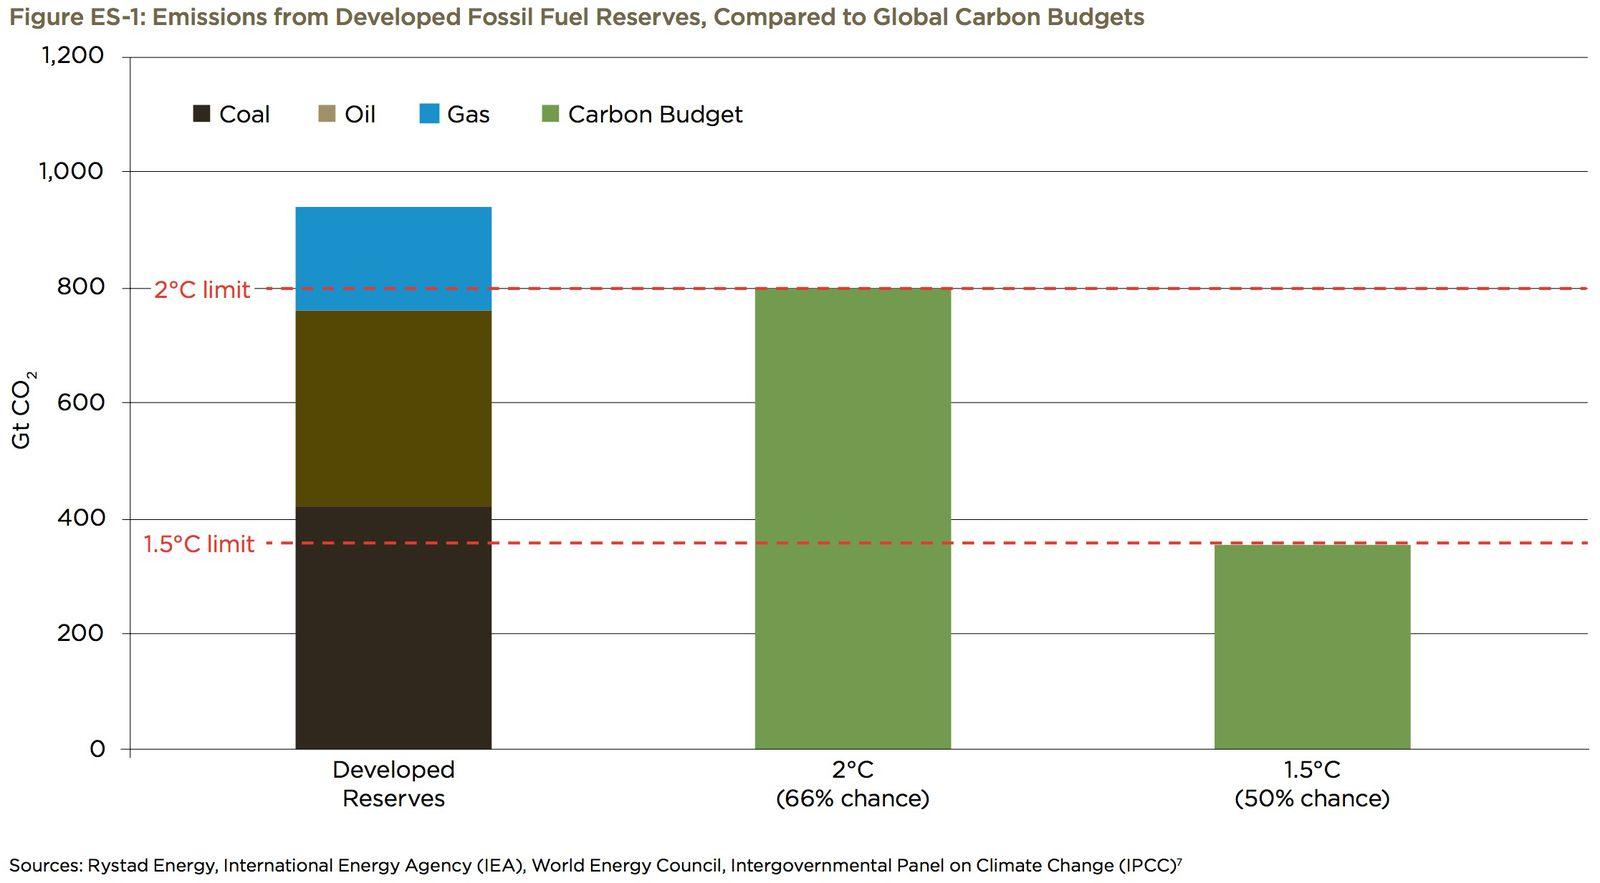 carbon budget vs. reserves